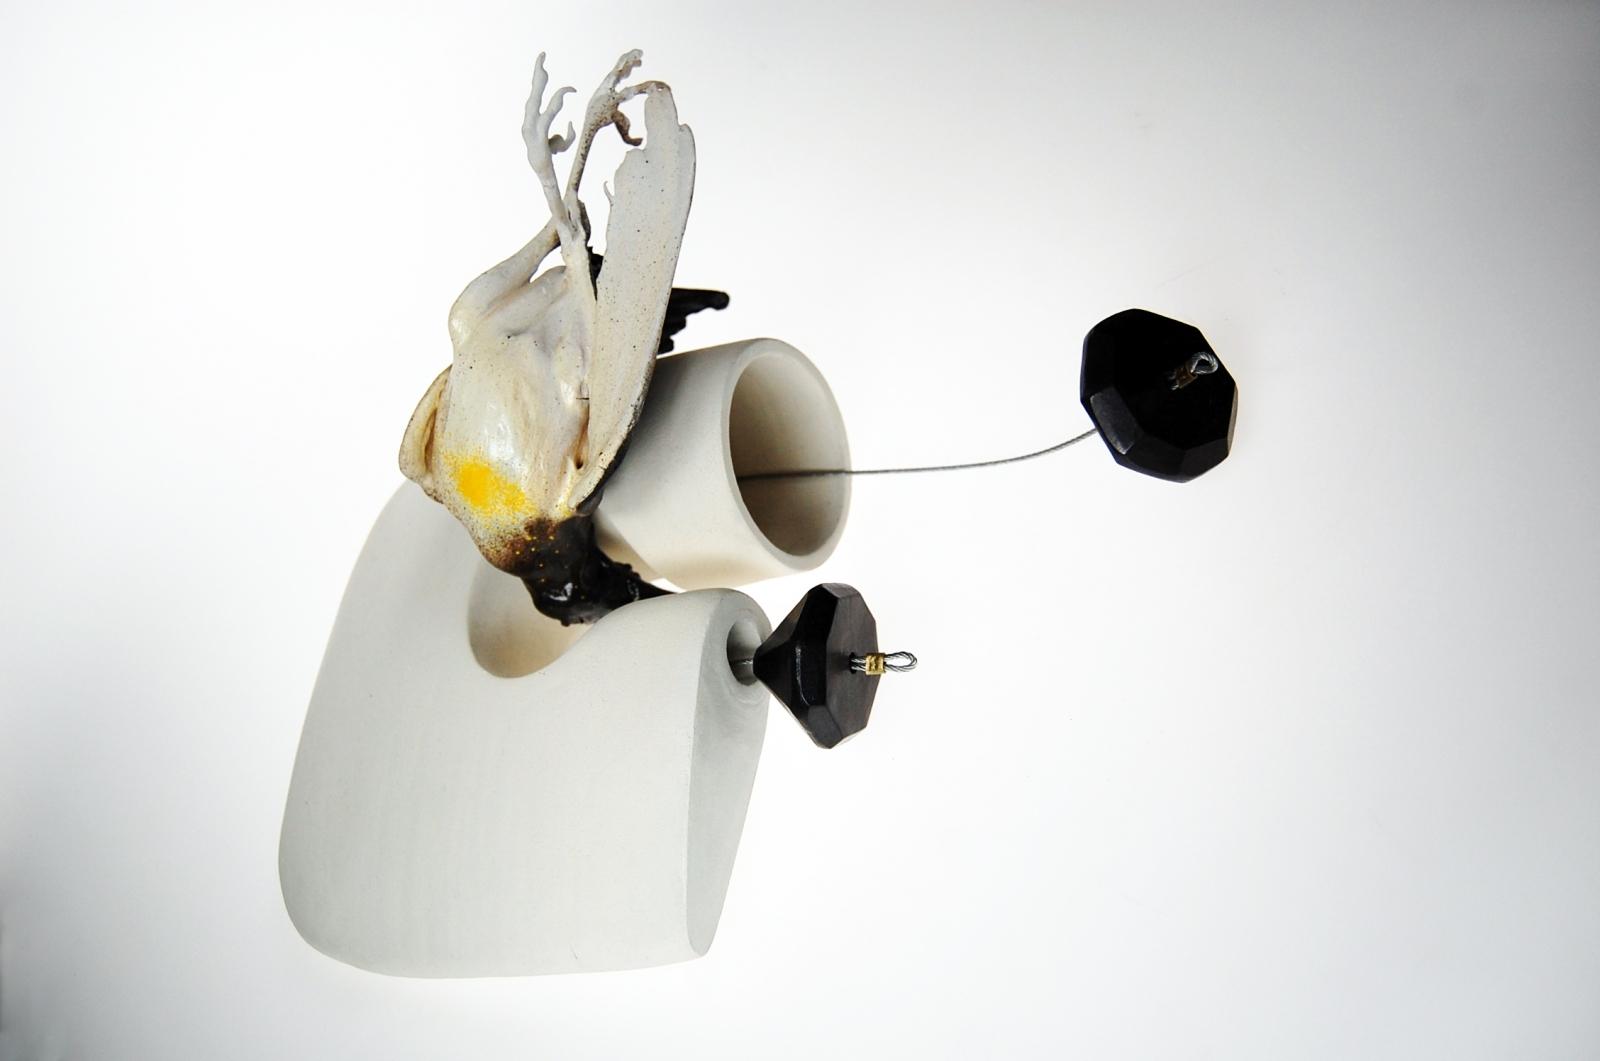 U-tube-bird-G-Mahon.jpg#asset:8576